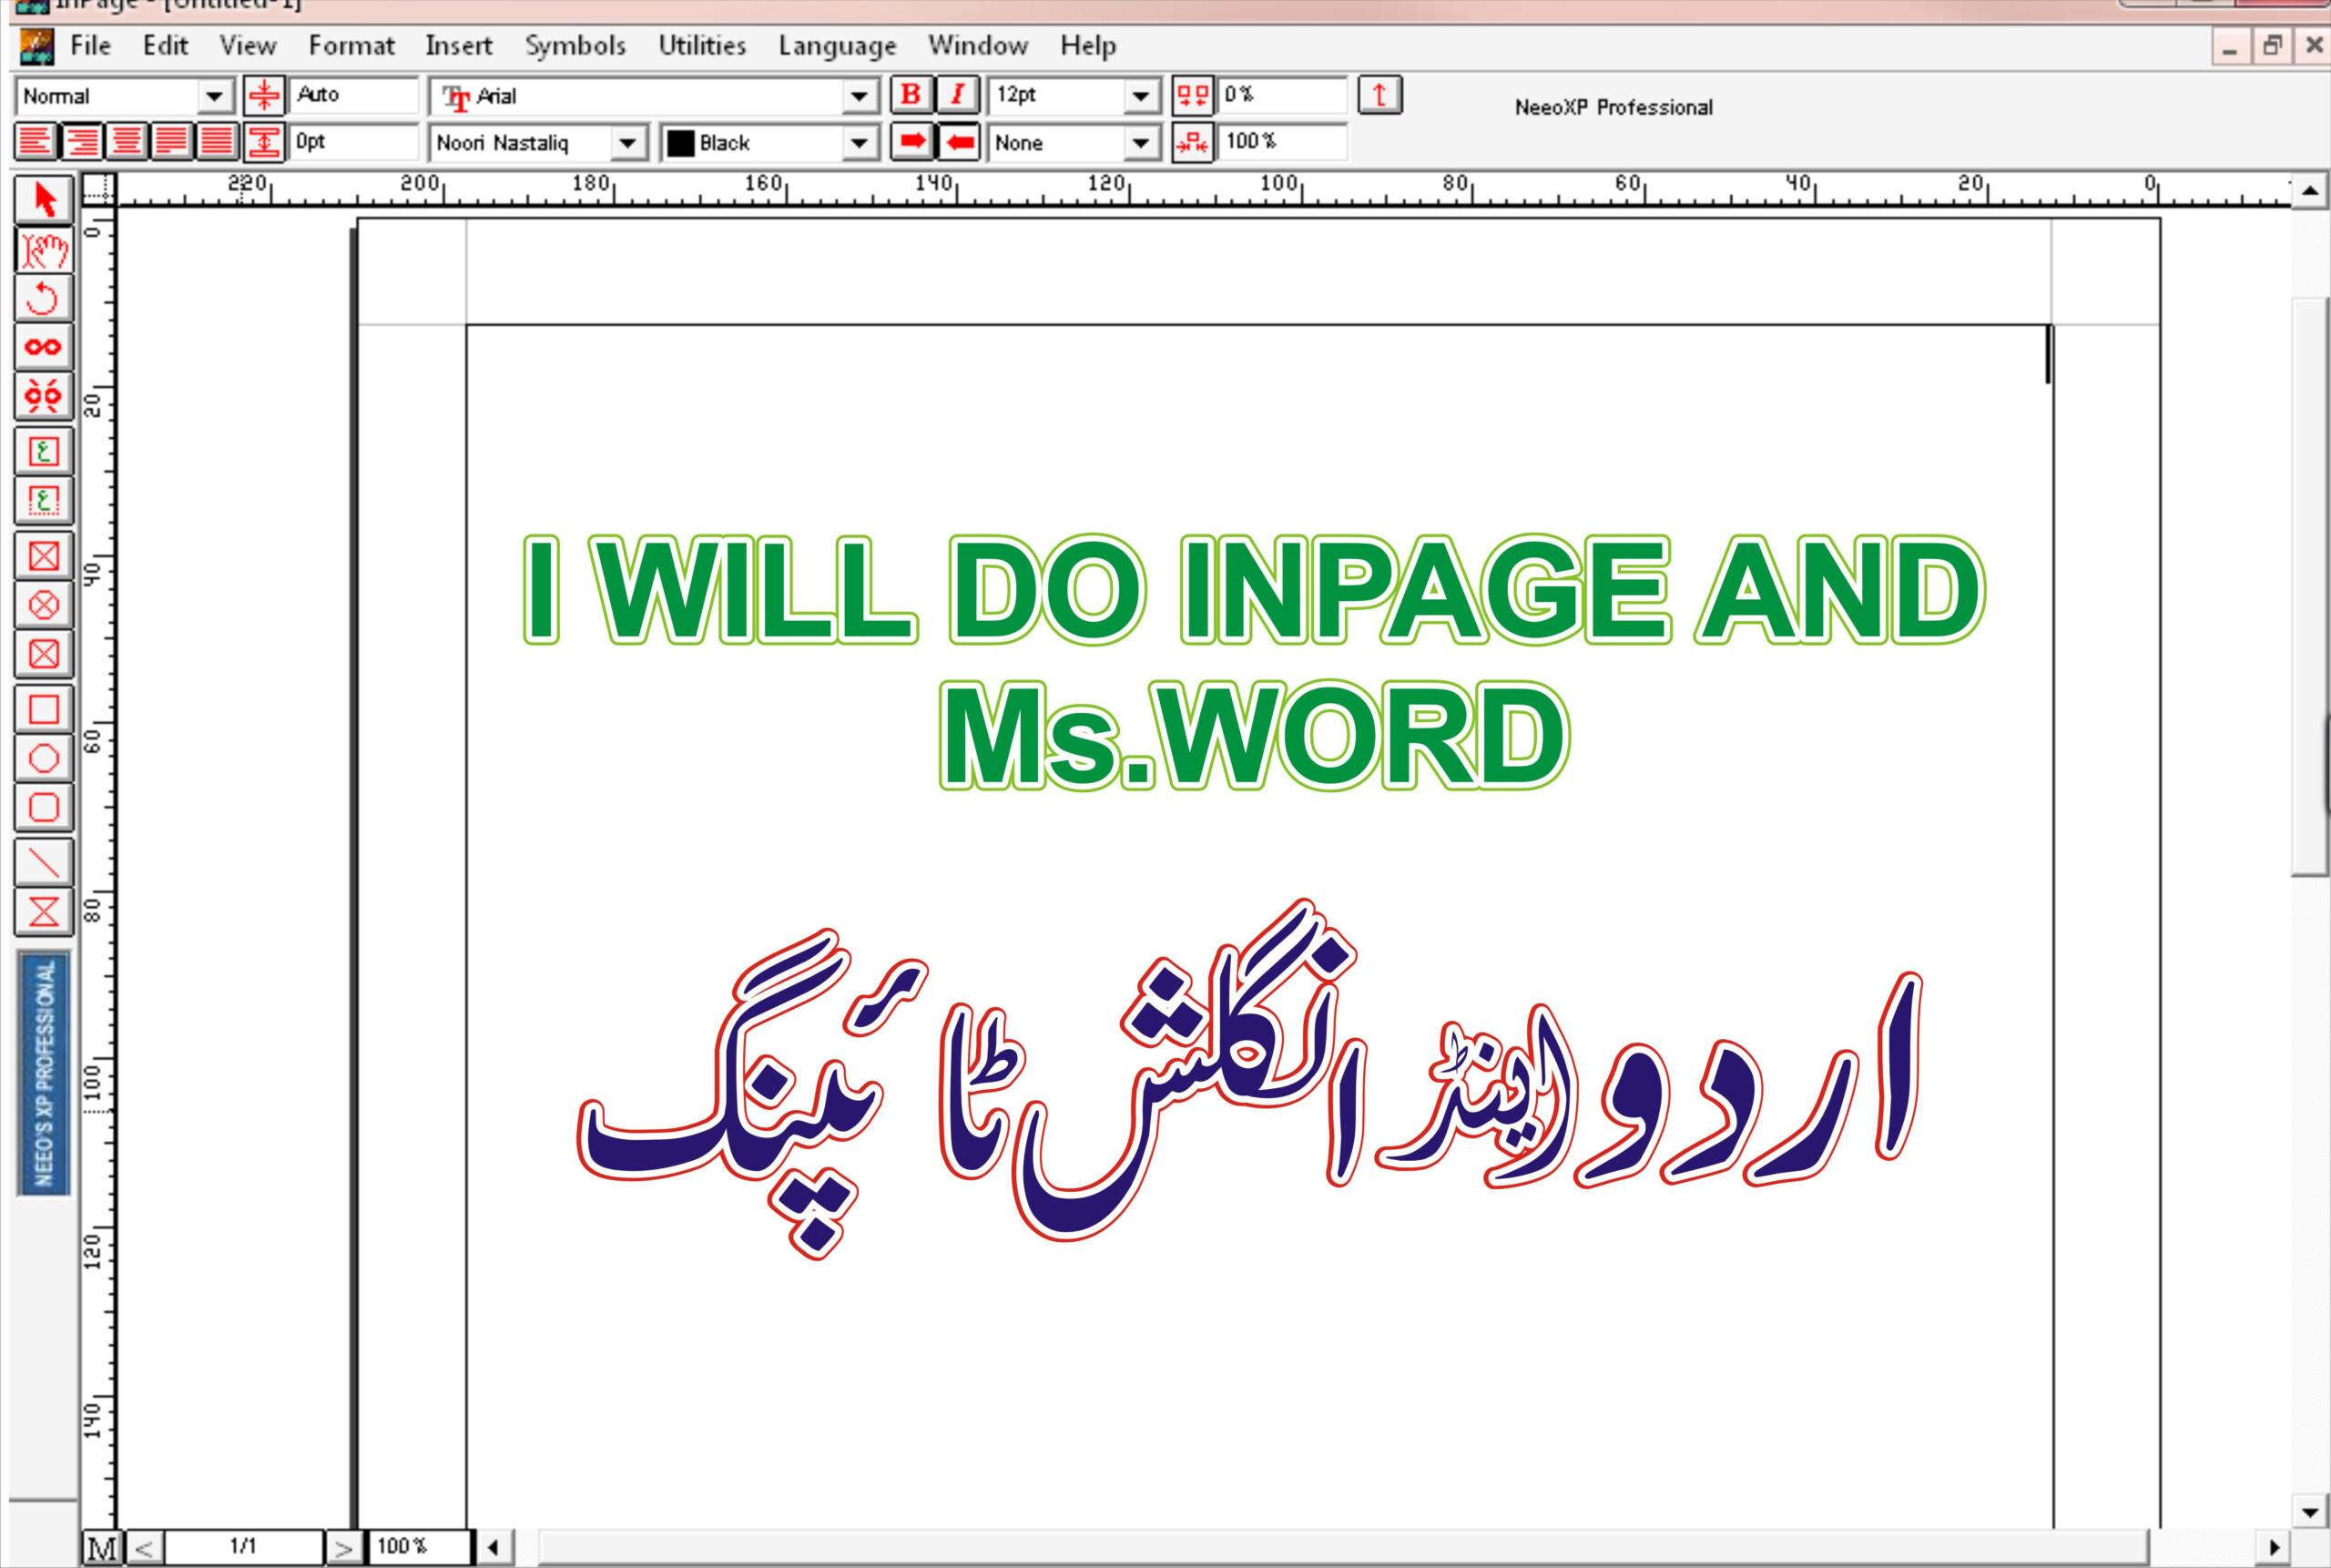 Do Urdu,english Typing And Setting On Inpagechaudhrgraphics